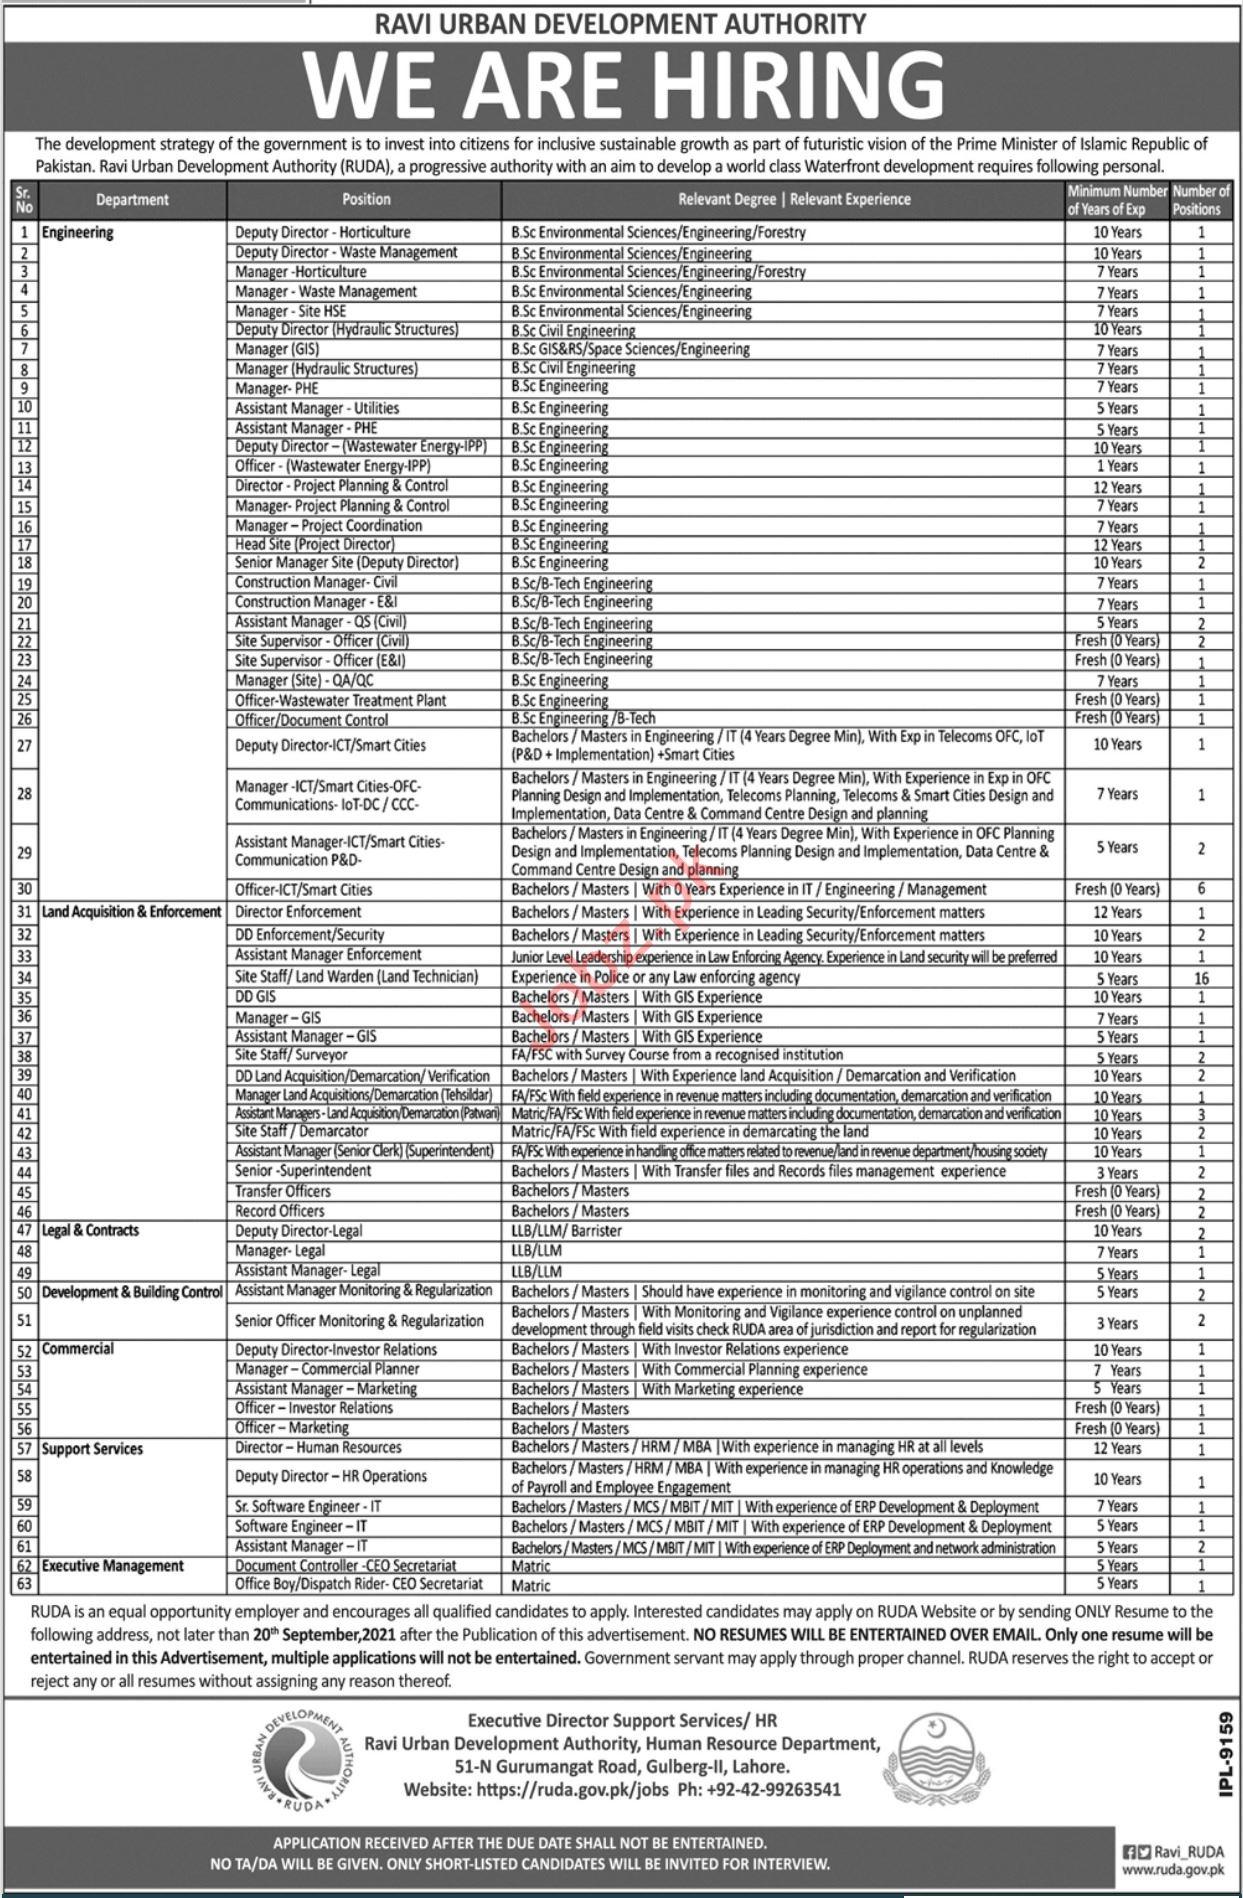 Ravi Urban Development Authority RUDA Jobs 2021 In Lahore